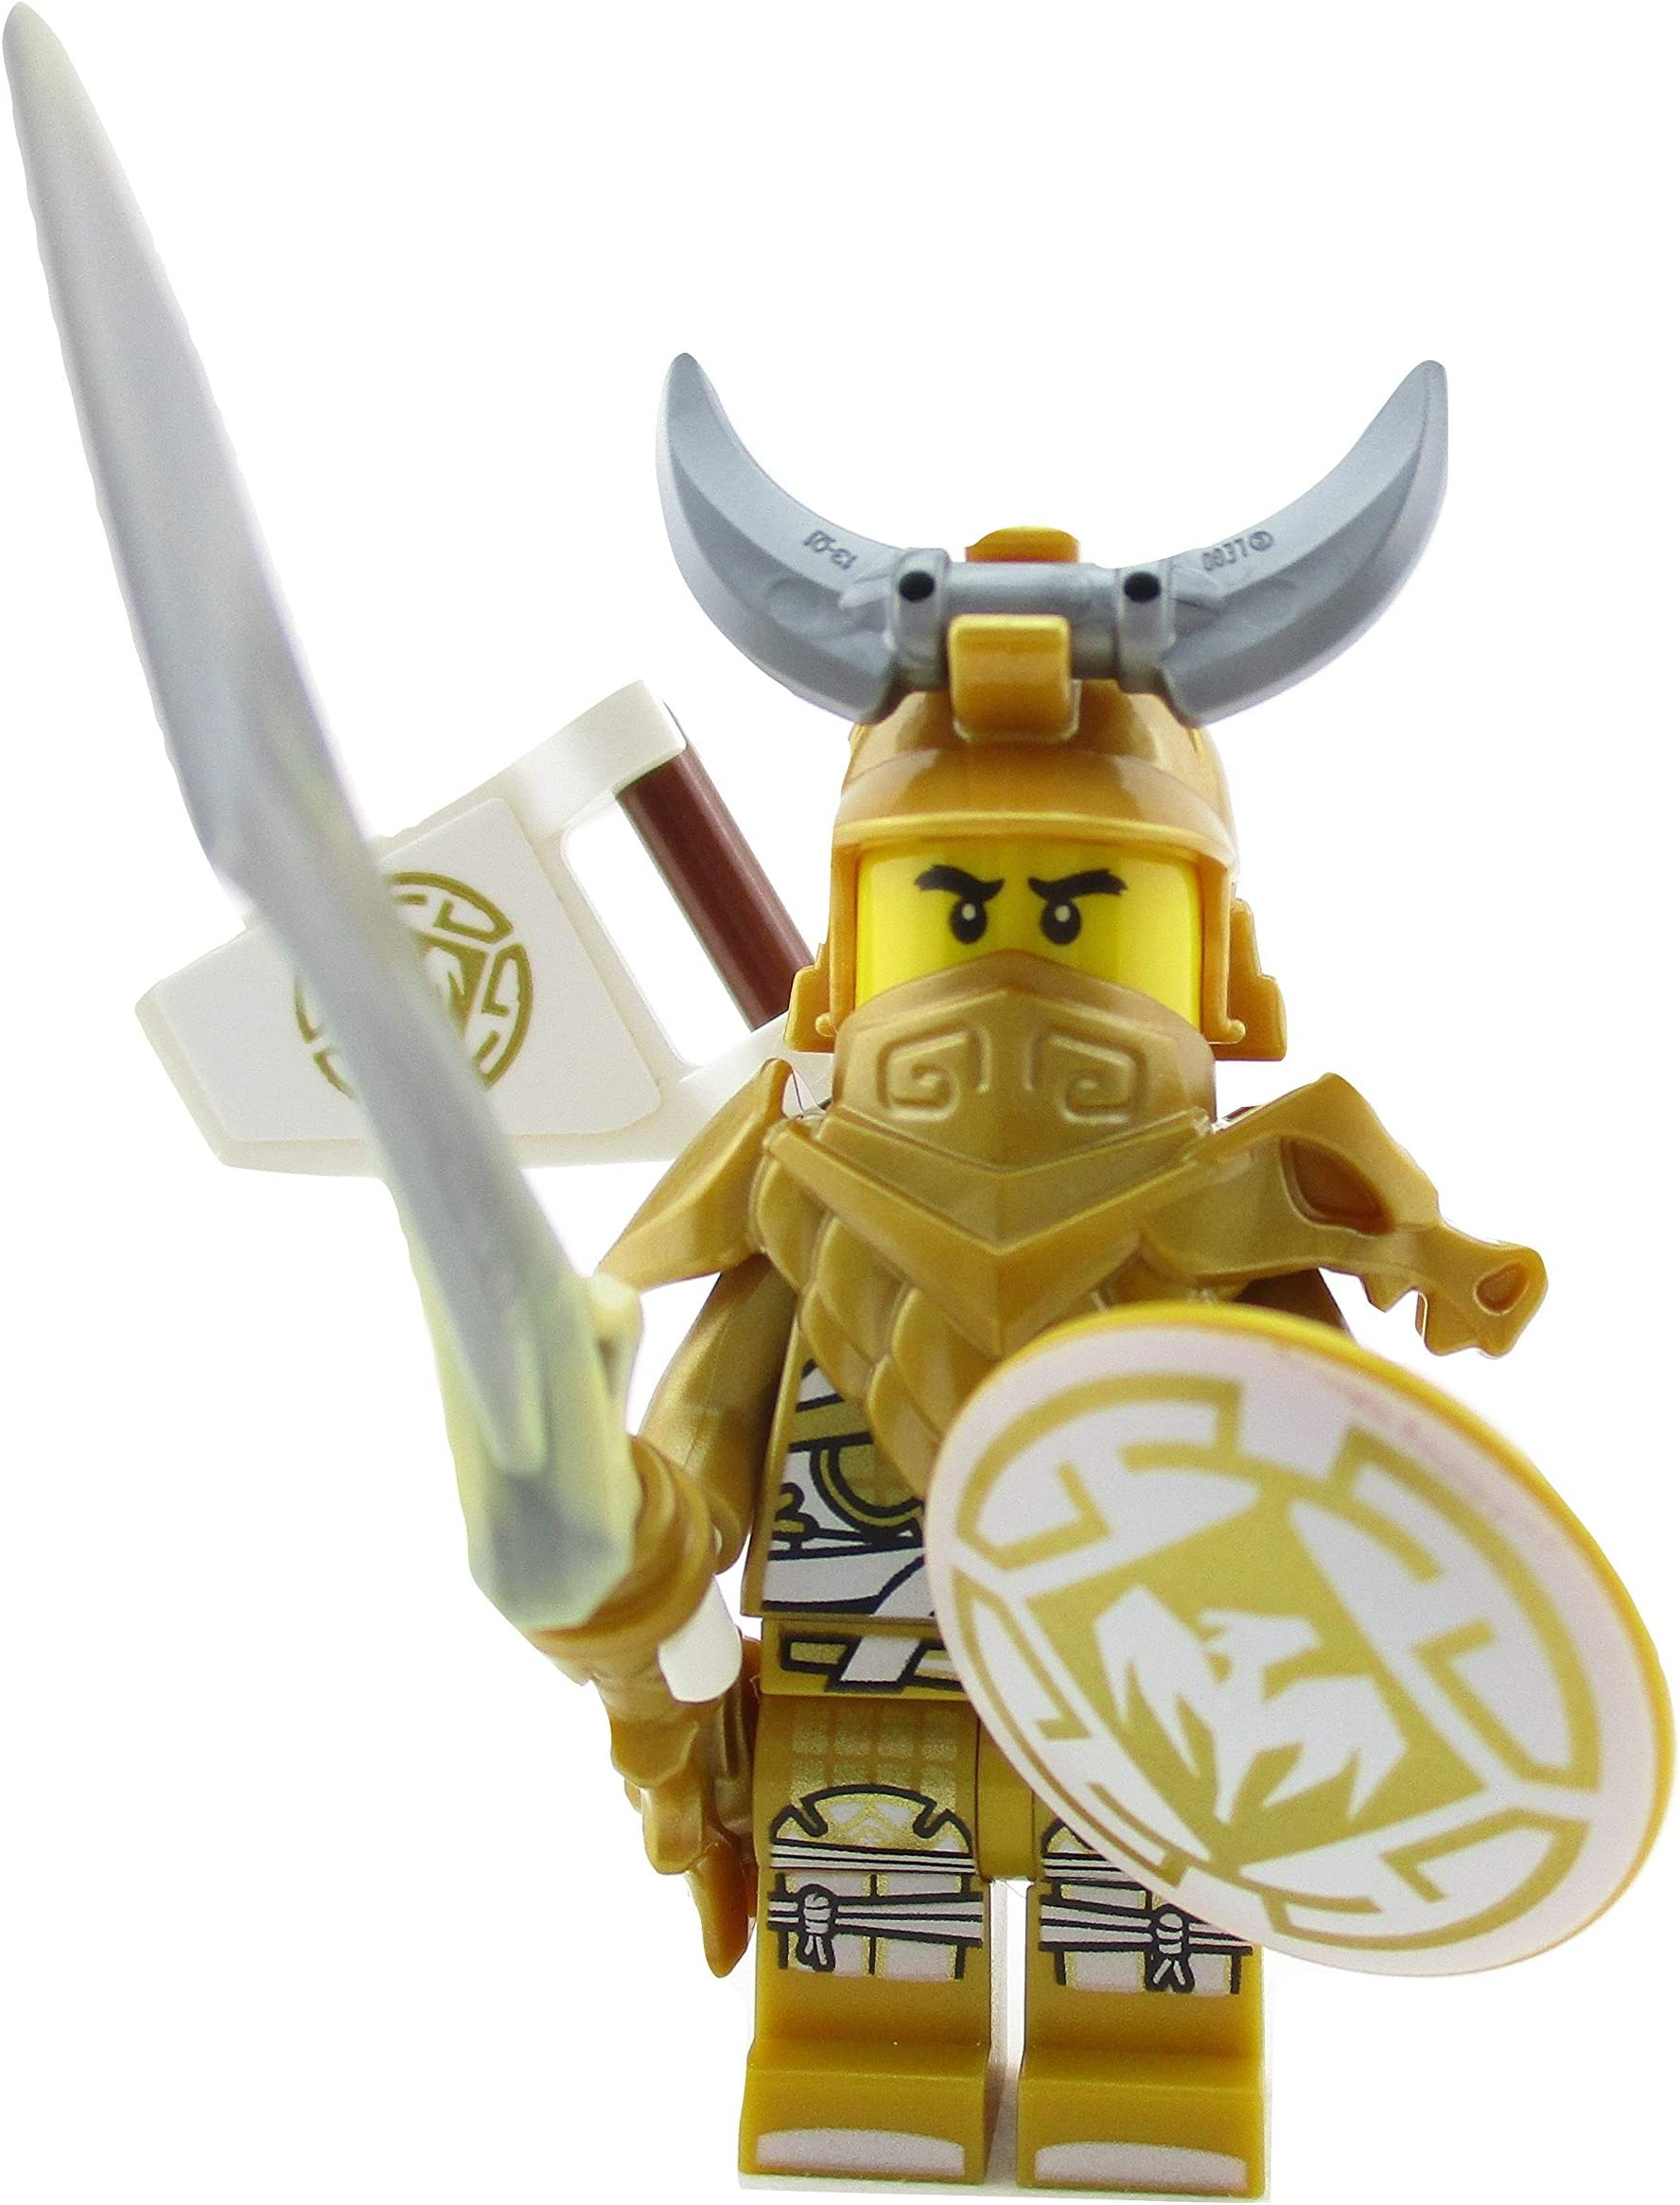 Lego ninjago golden dragon armor season 9 anabolic steroid injection sites